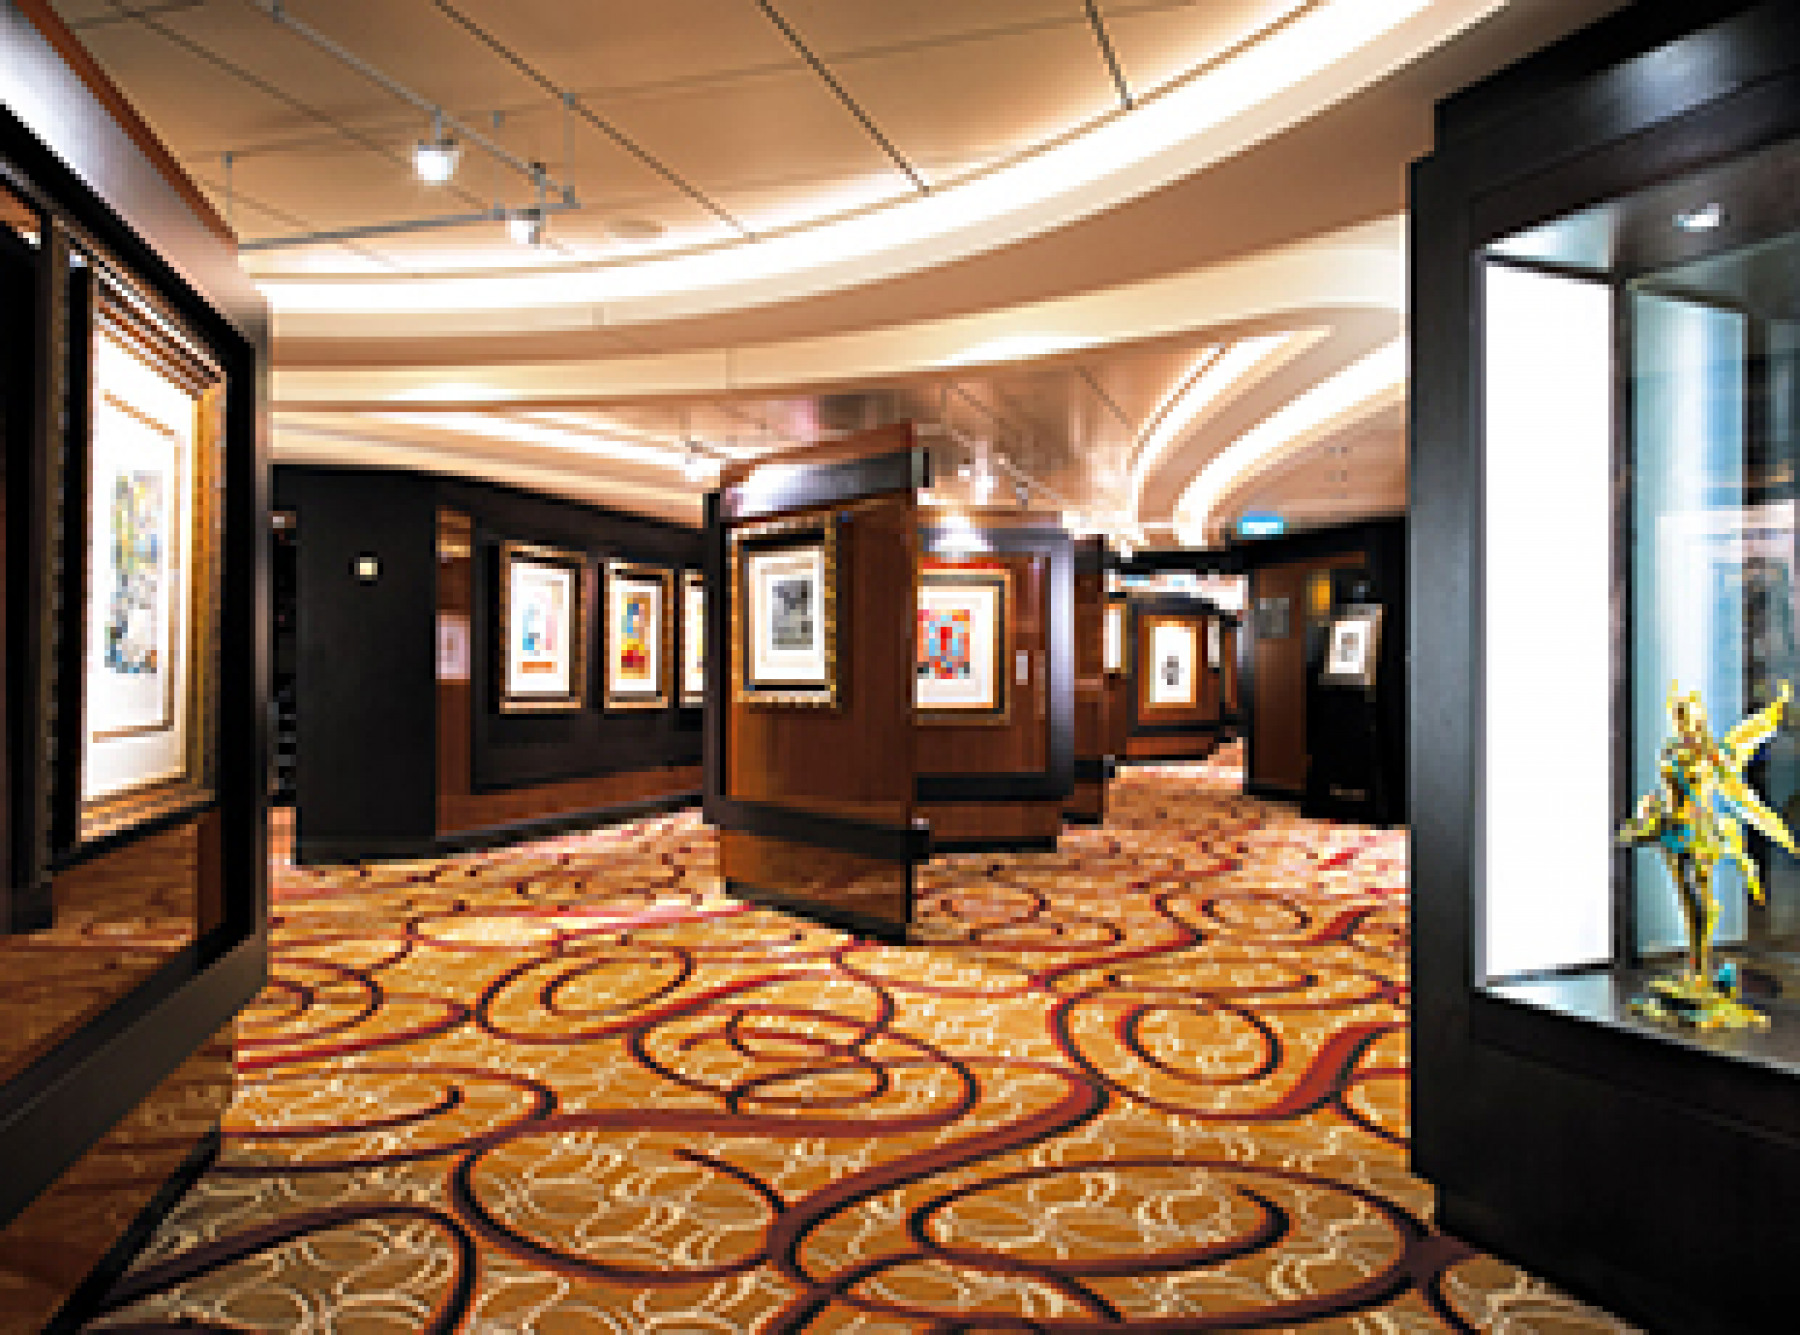 Norwegian Cruise Line Norwegian Epic Interior The Collection Art Gallery.jpg